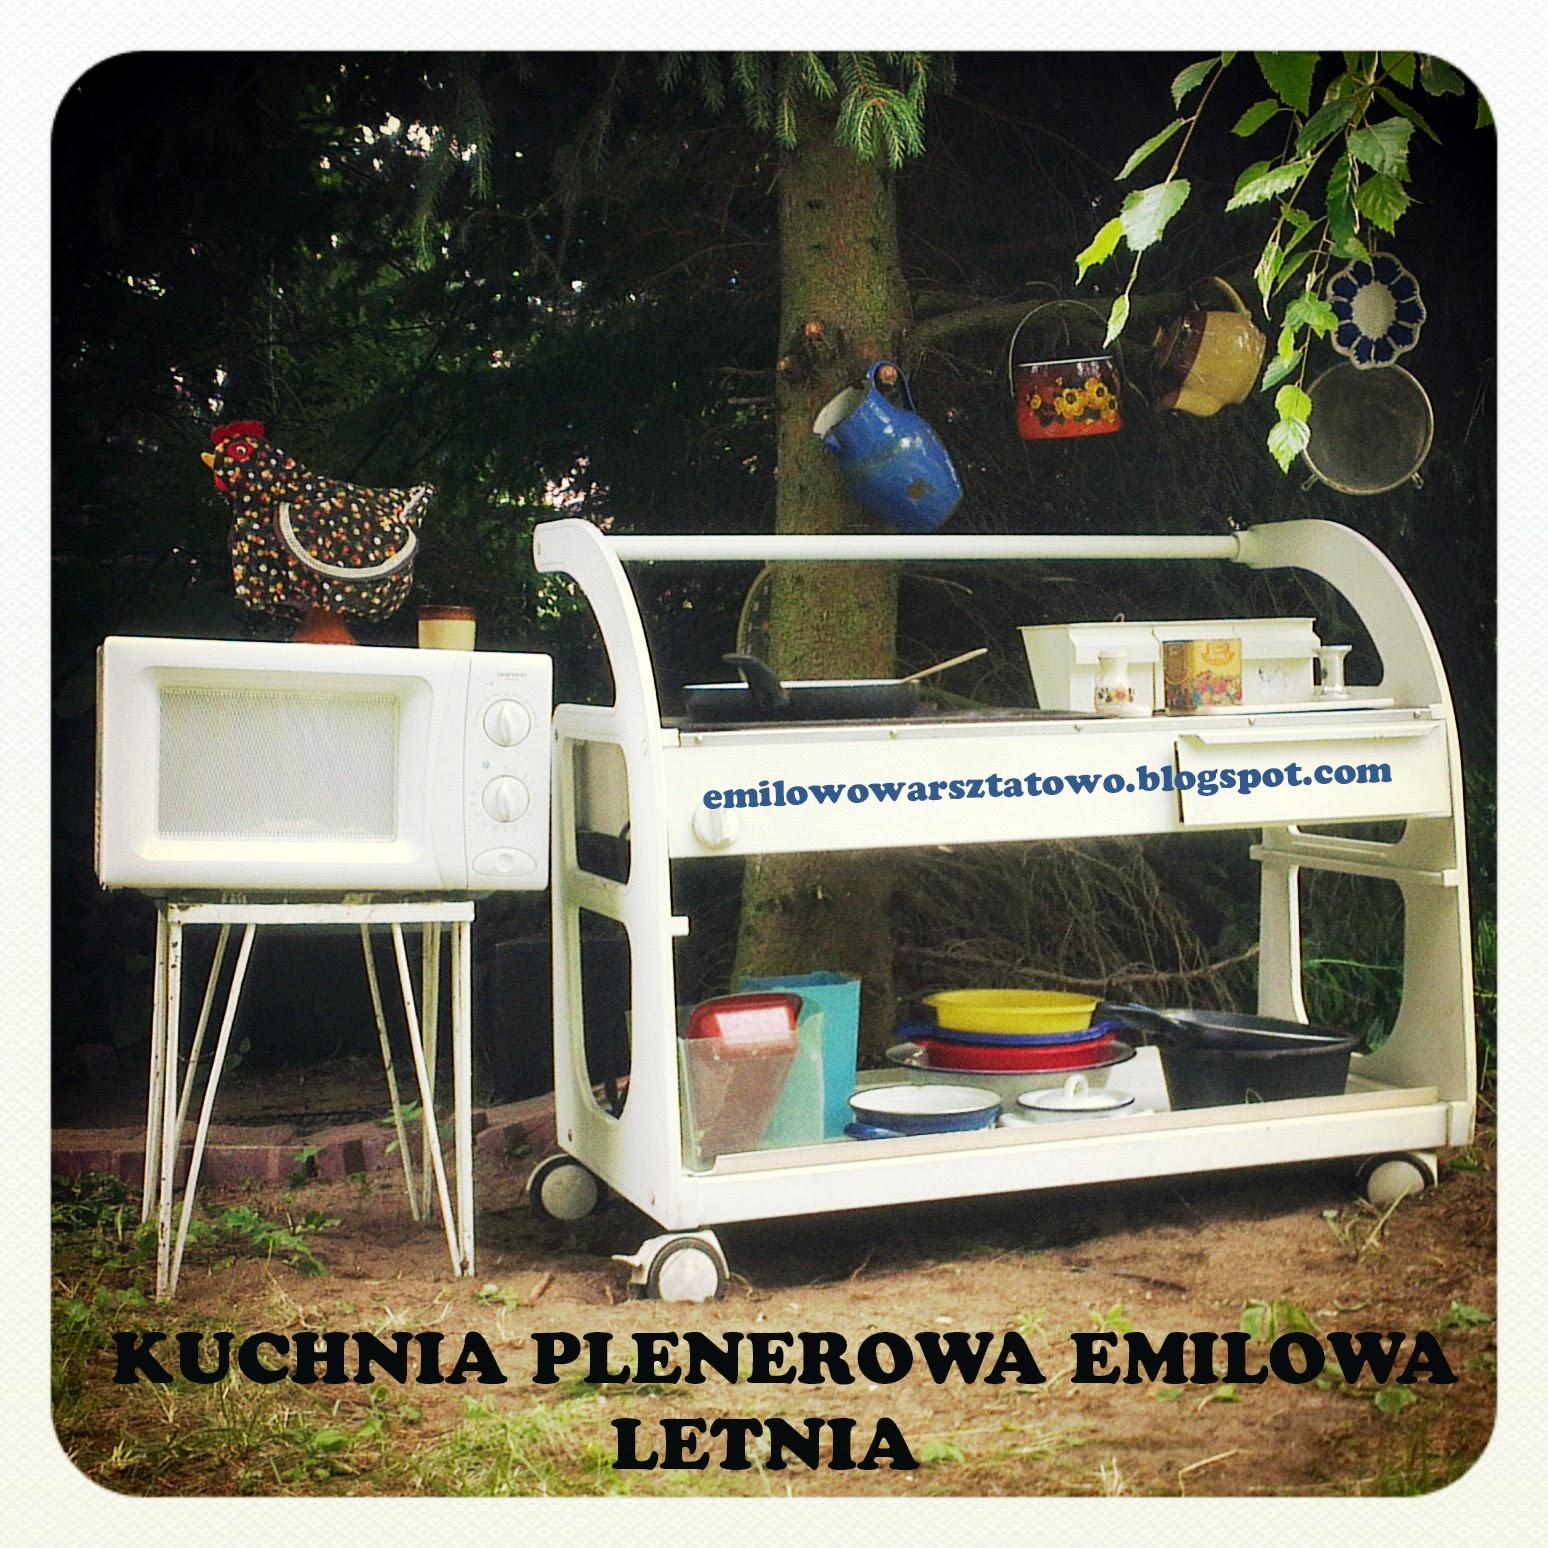 http://emilowowarsztatowo.blogspot.com/2014/07/kuchnia-plenerowa-emilowa-letnia.html